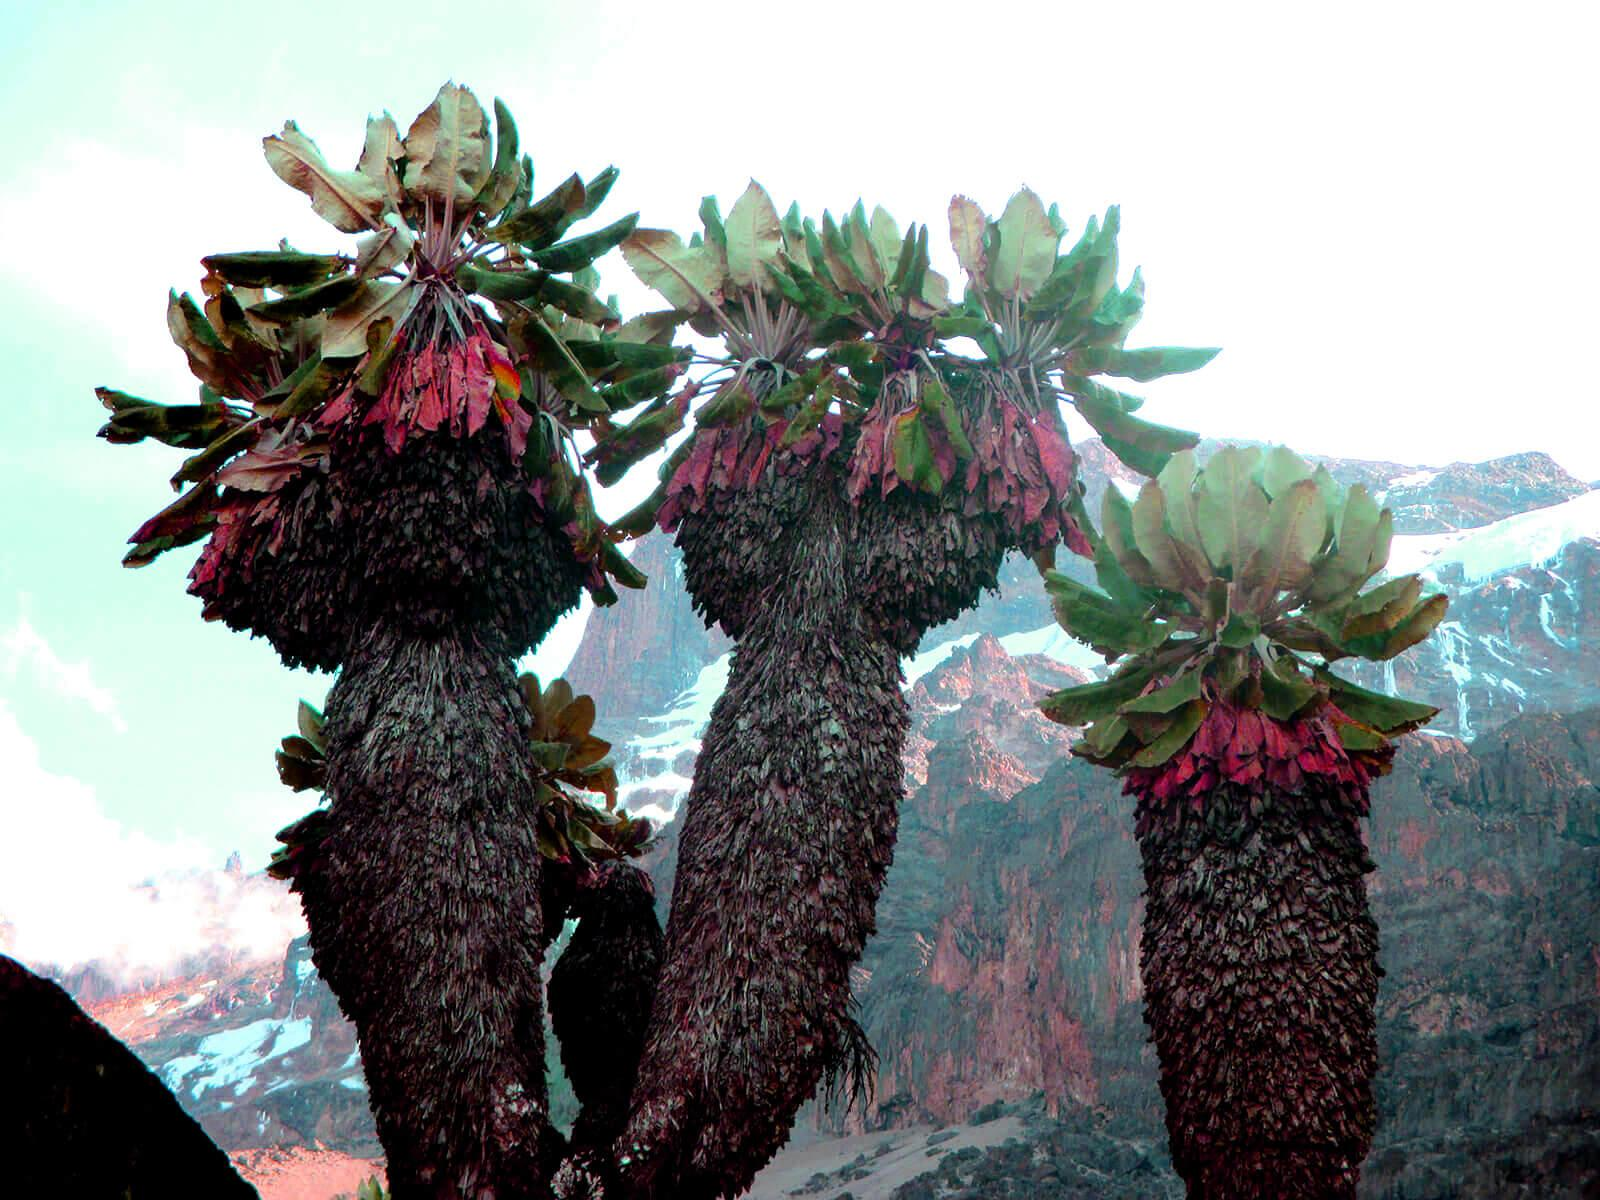 Kilimanjaro climate zones